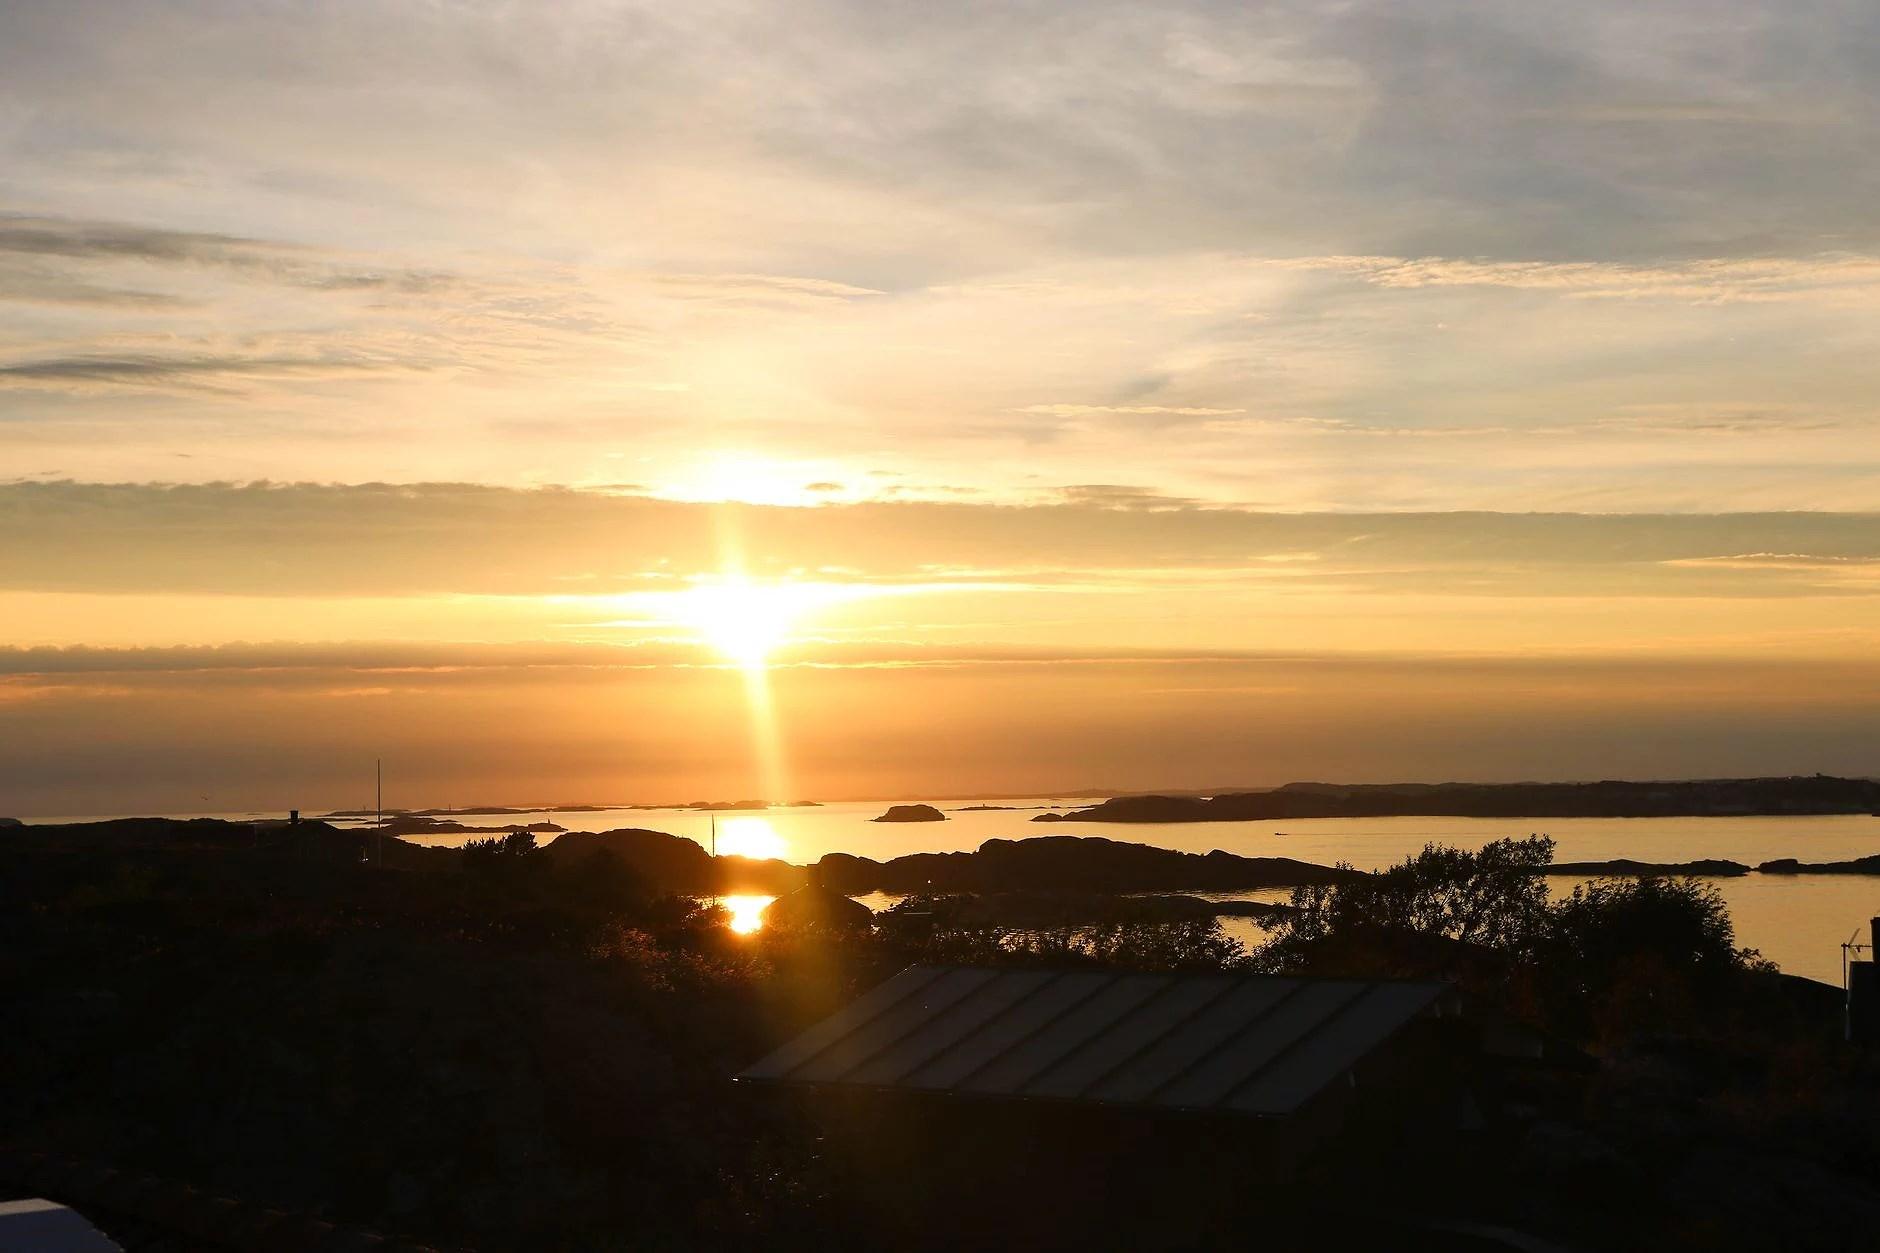 last night's magical sunset